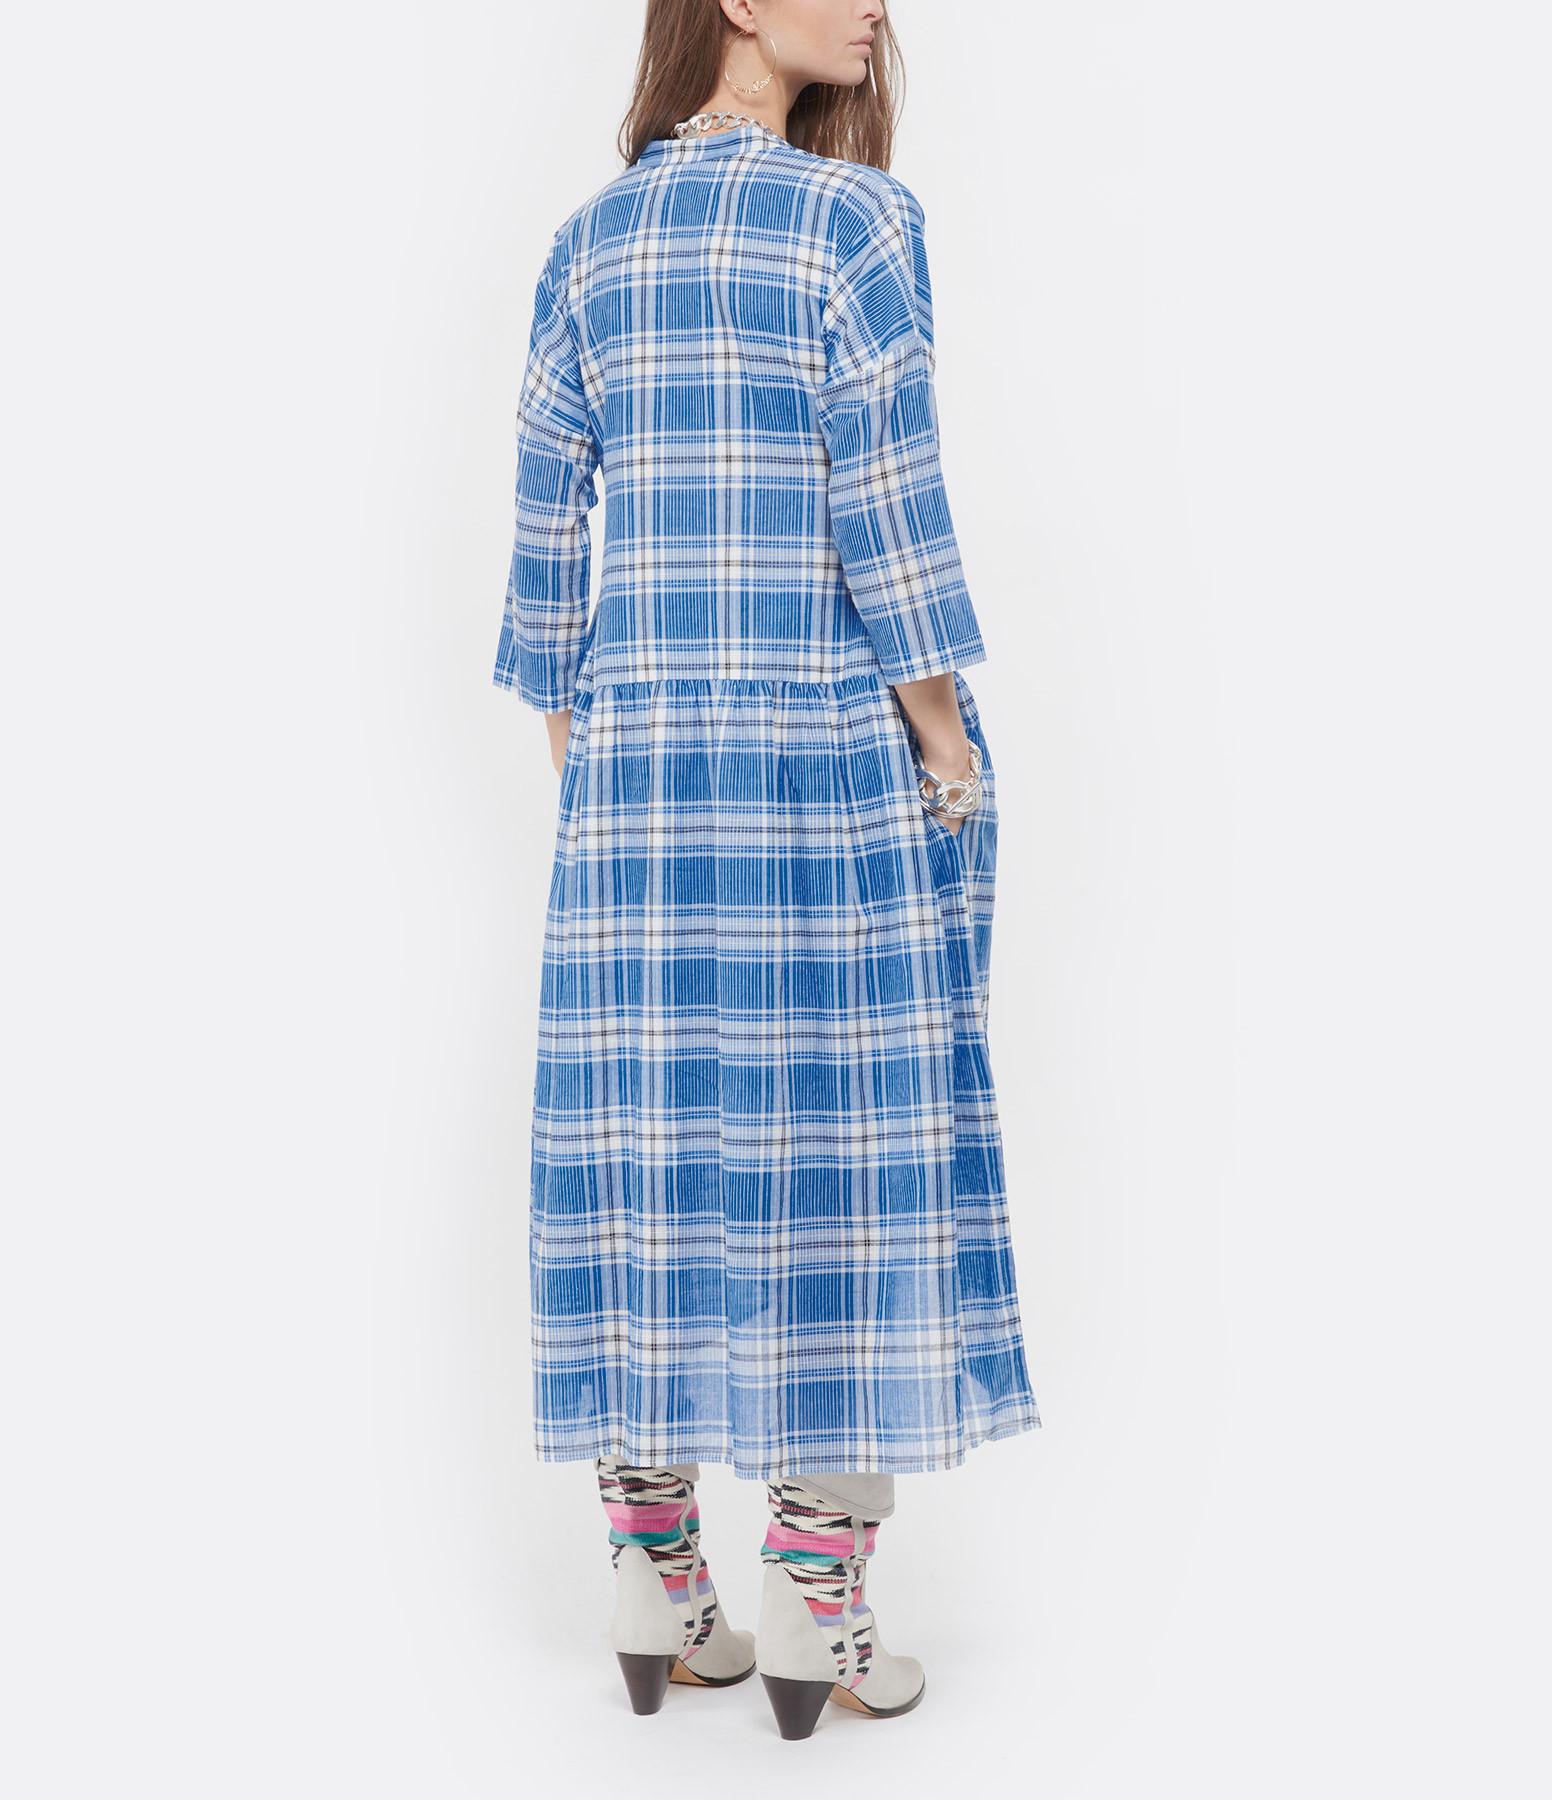 MII - Robe Tara Coton Carreaux Bleu